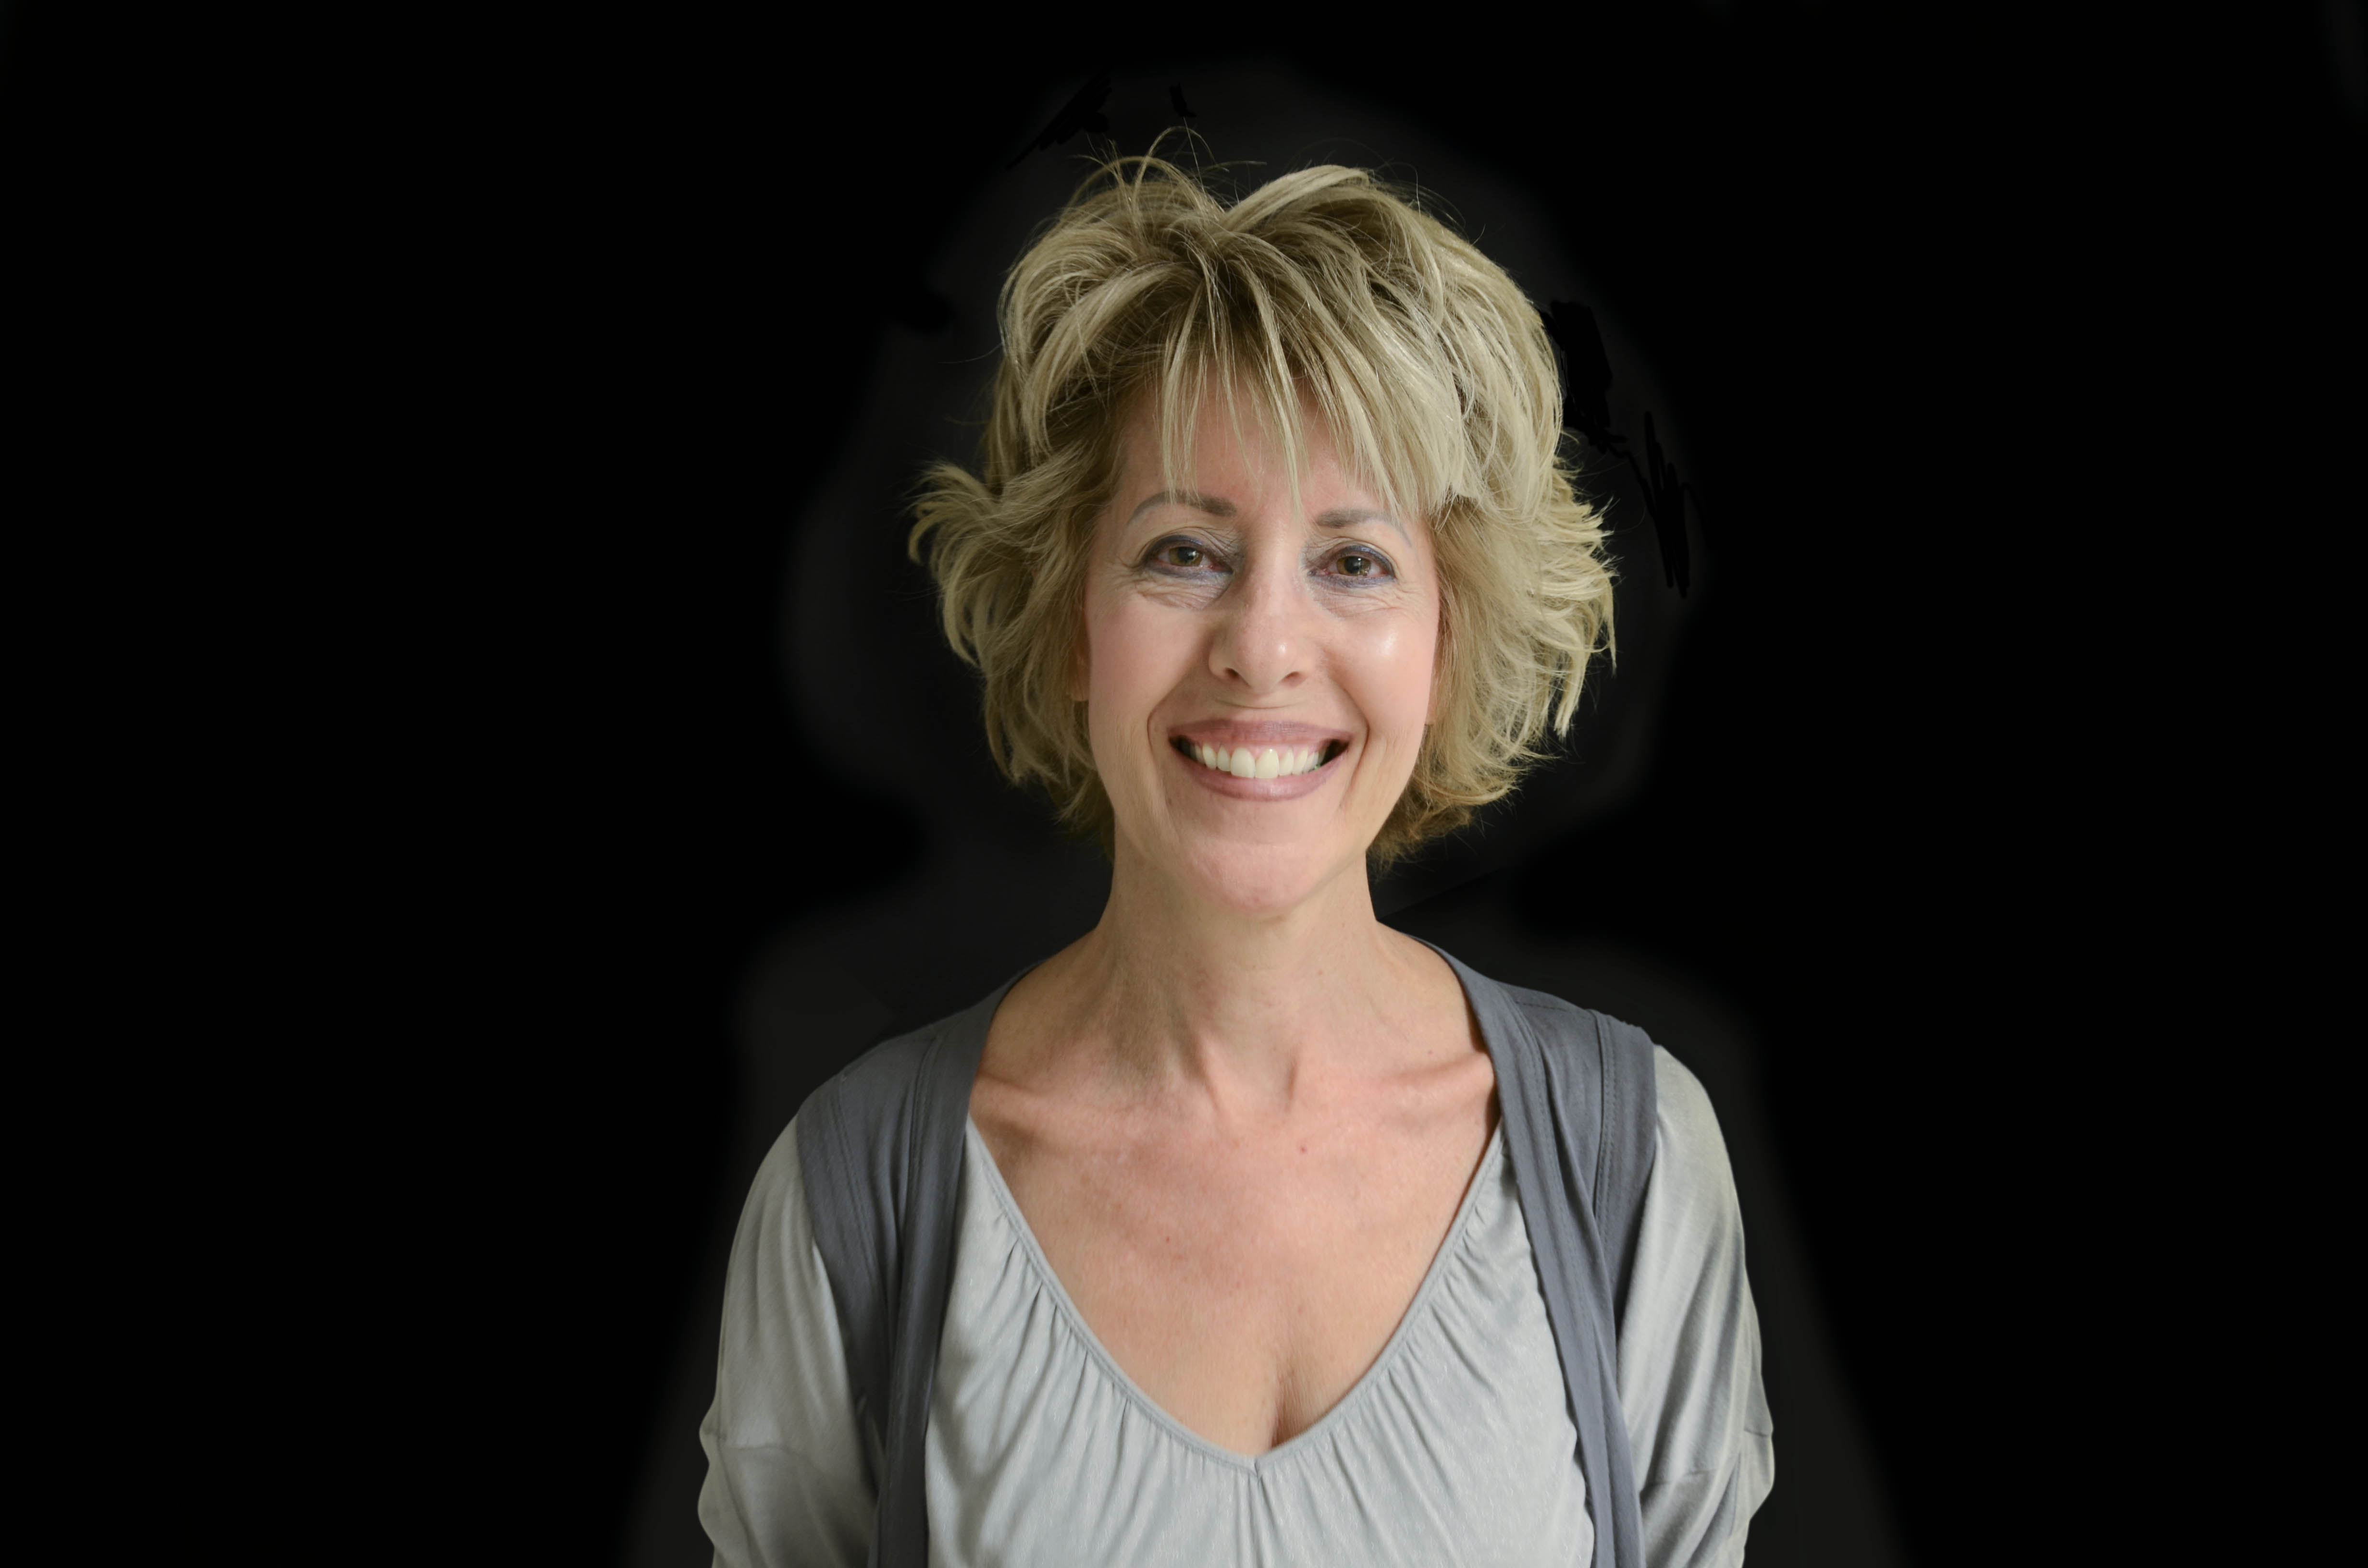 FHI Heat Adds Nancy Wilhelmn to Their Growing Team